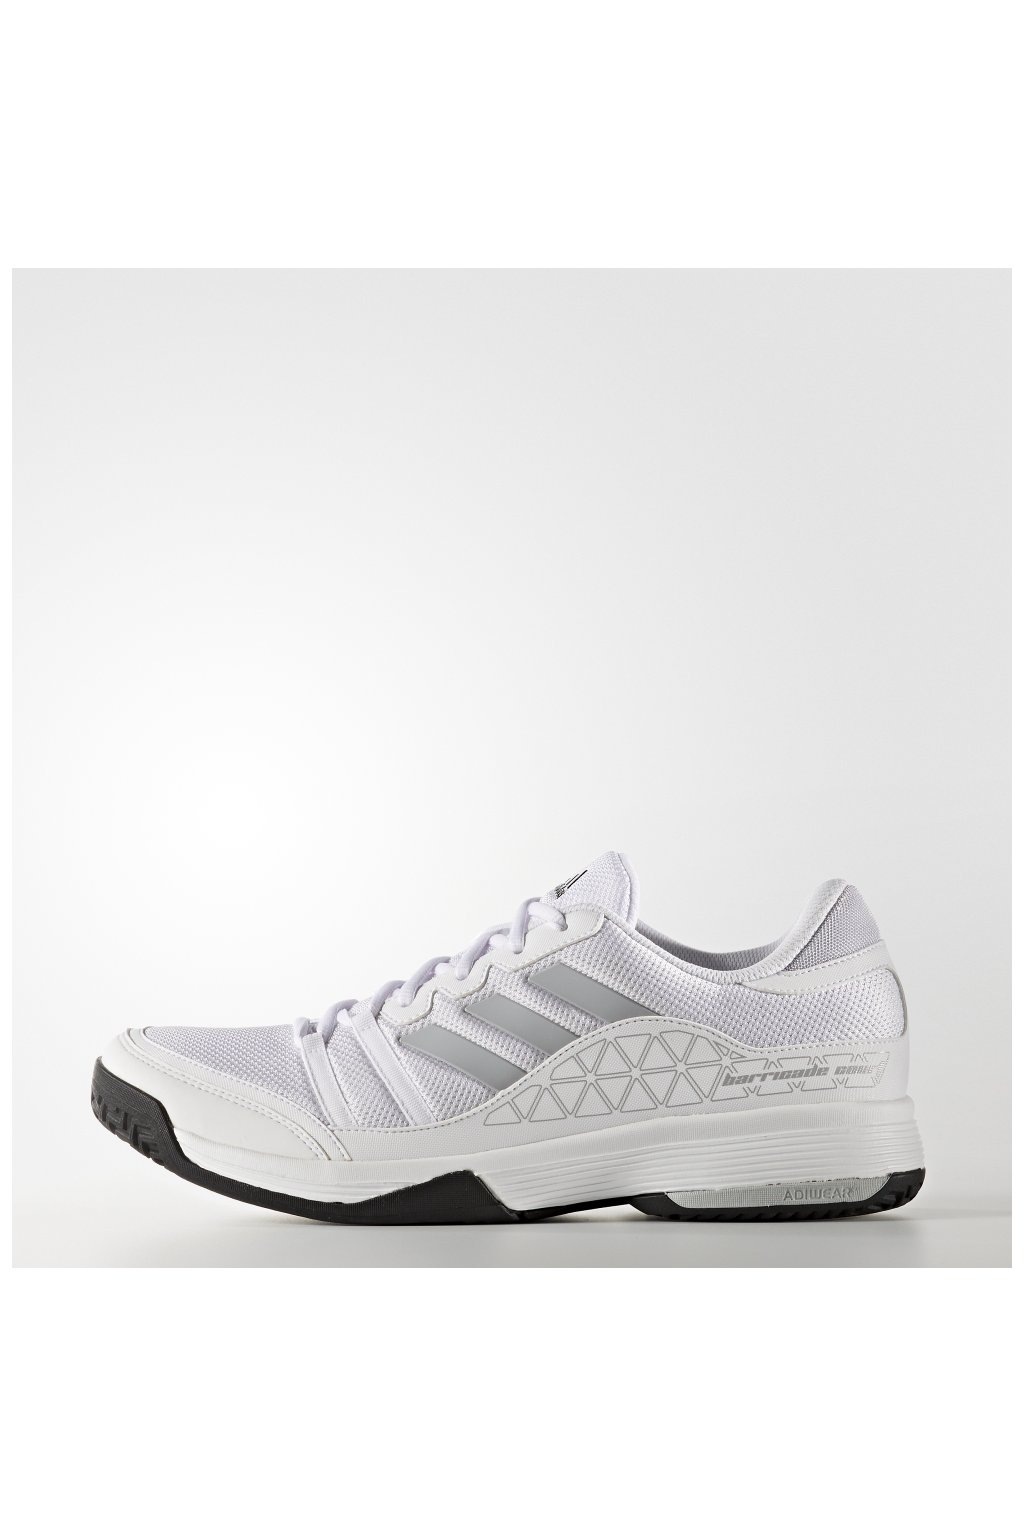 bb3325 panska tenisova obuv adidas barricade court